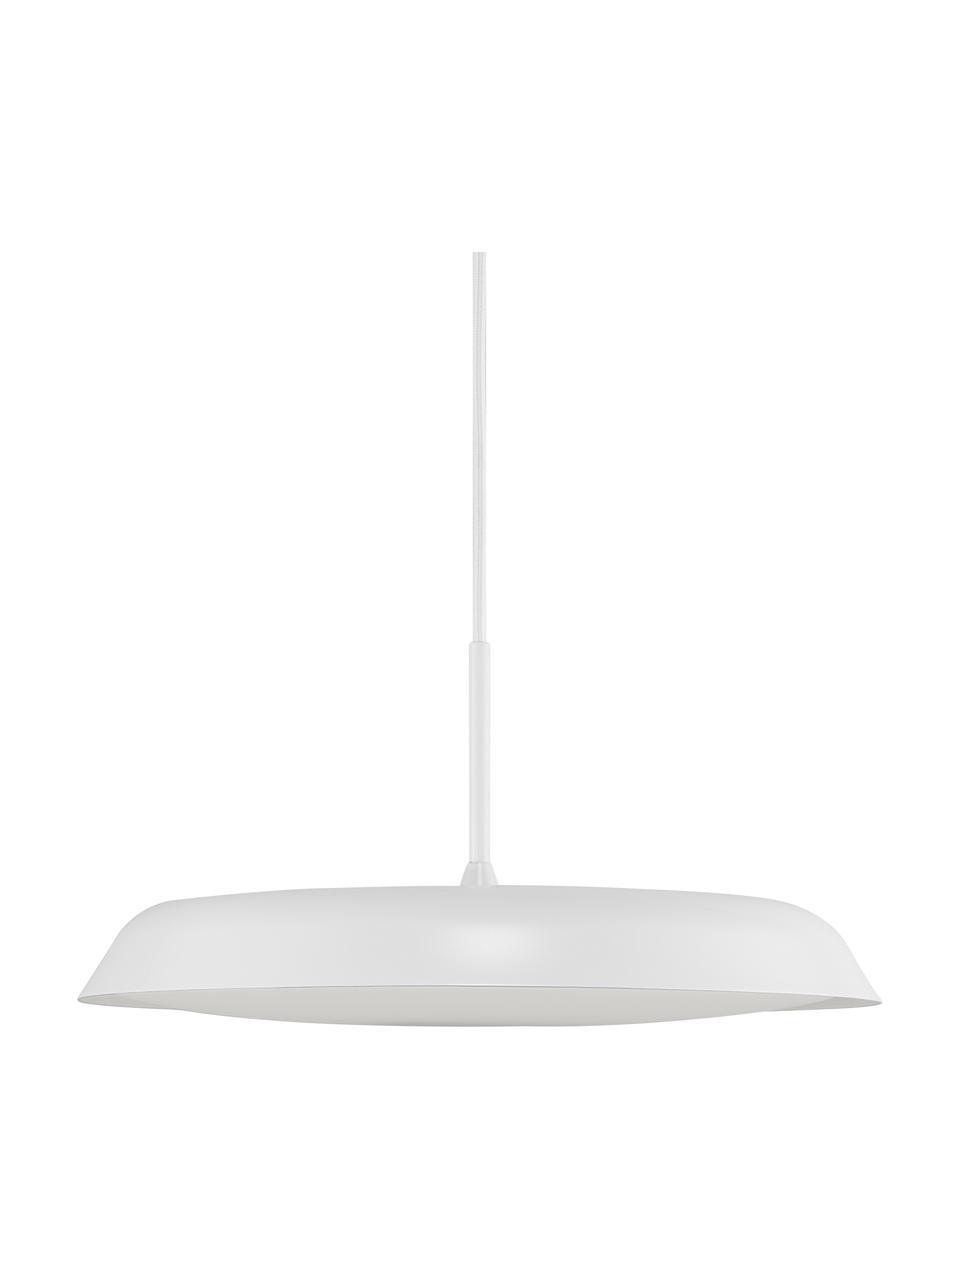 Dimmbare LED-Pendelleuchte Piso in Weiß, Lampenschirm: Metall, beschichtet, Weiß, Ø 36 x H 17 cm